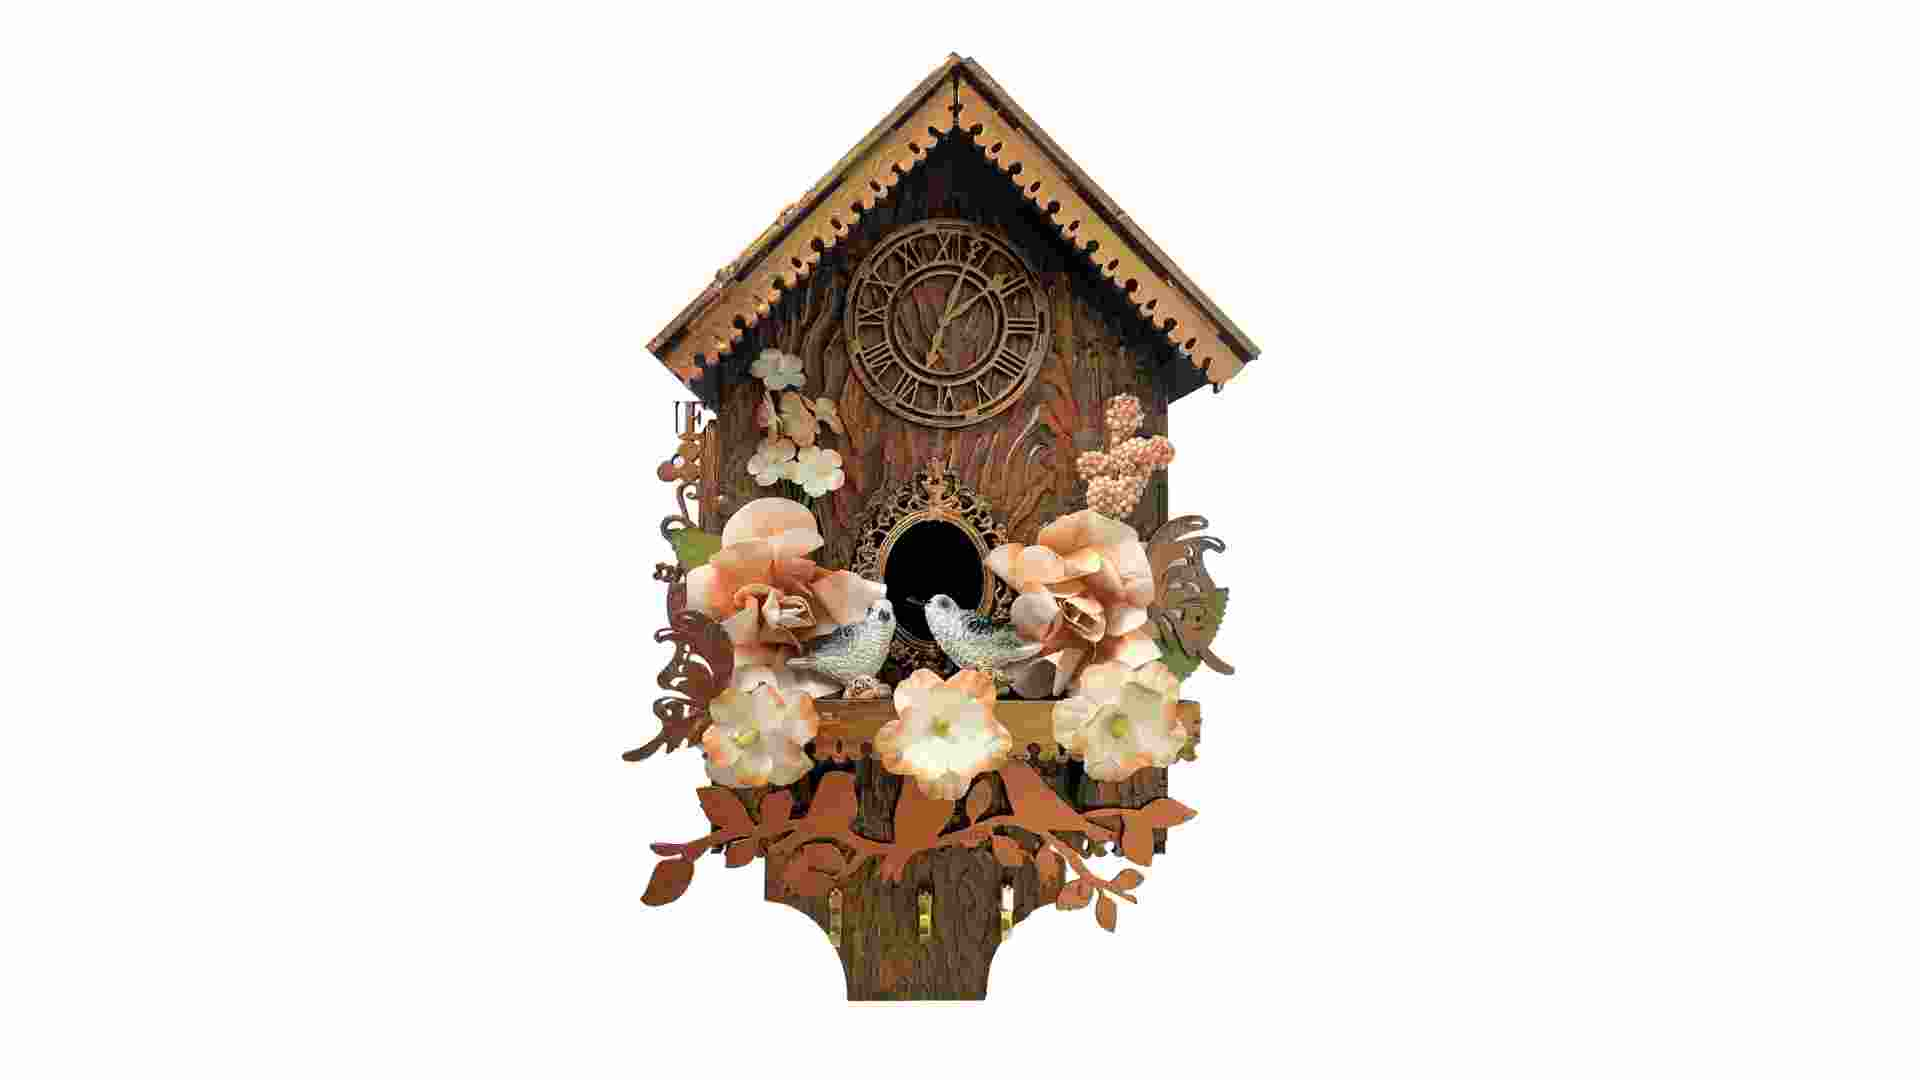 Spring-Birdhouse-DIY-Art-Tutorial-by-Erika-Venter-Powertex-Australia-Design-Team